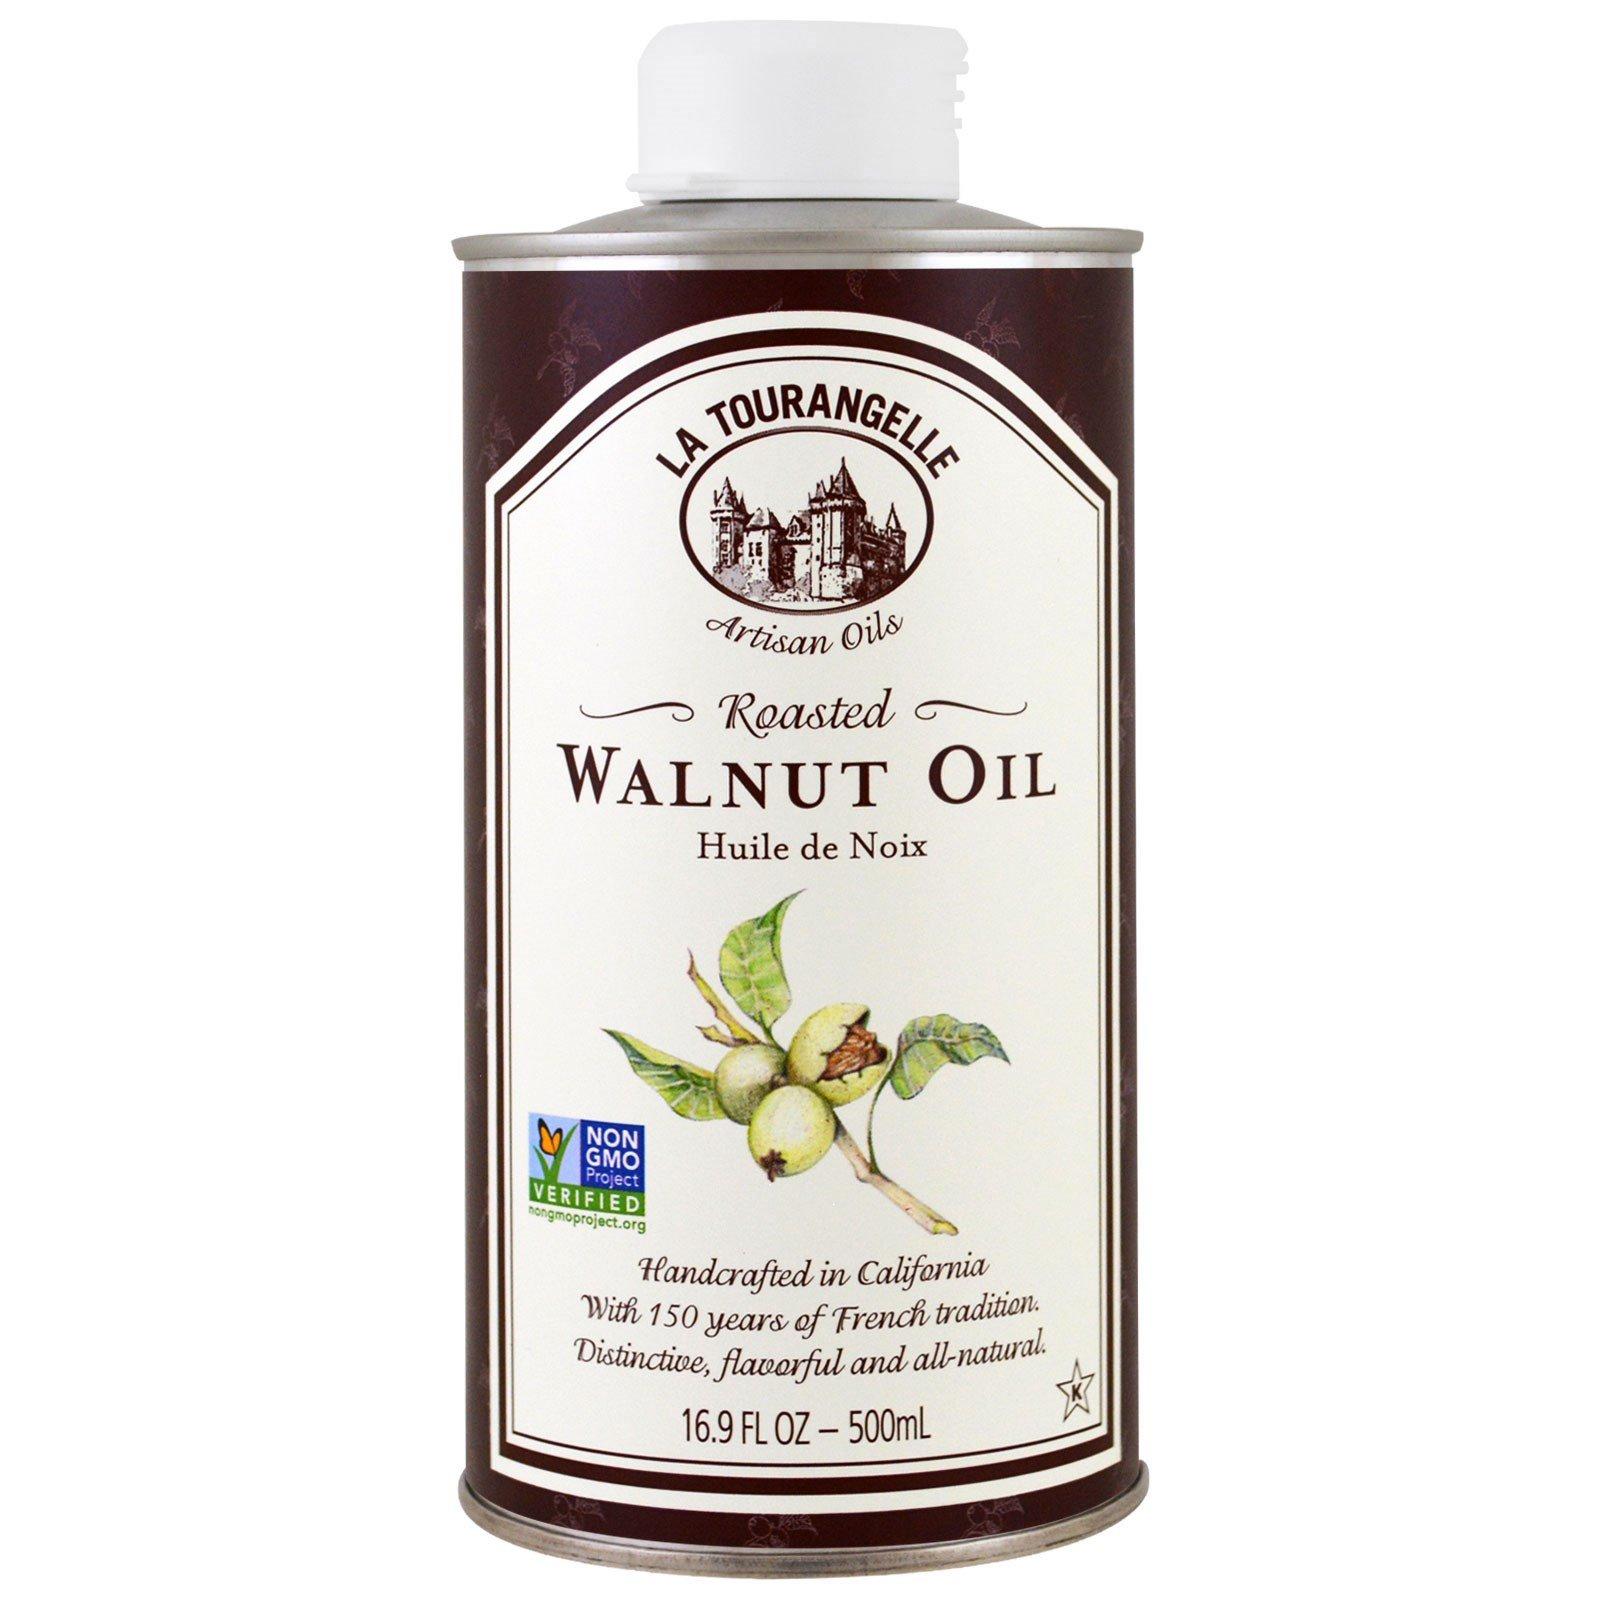 La Tourangelle, Walnut Oil, 16.9 fl oz (500 ml) - 2PC